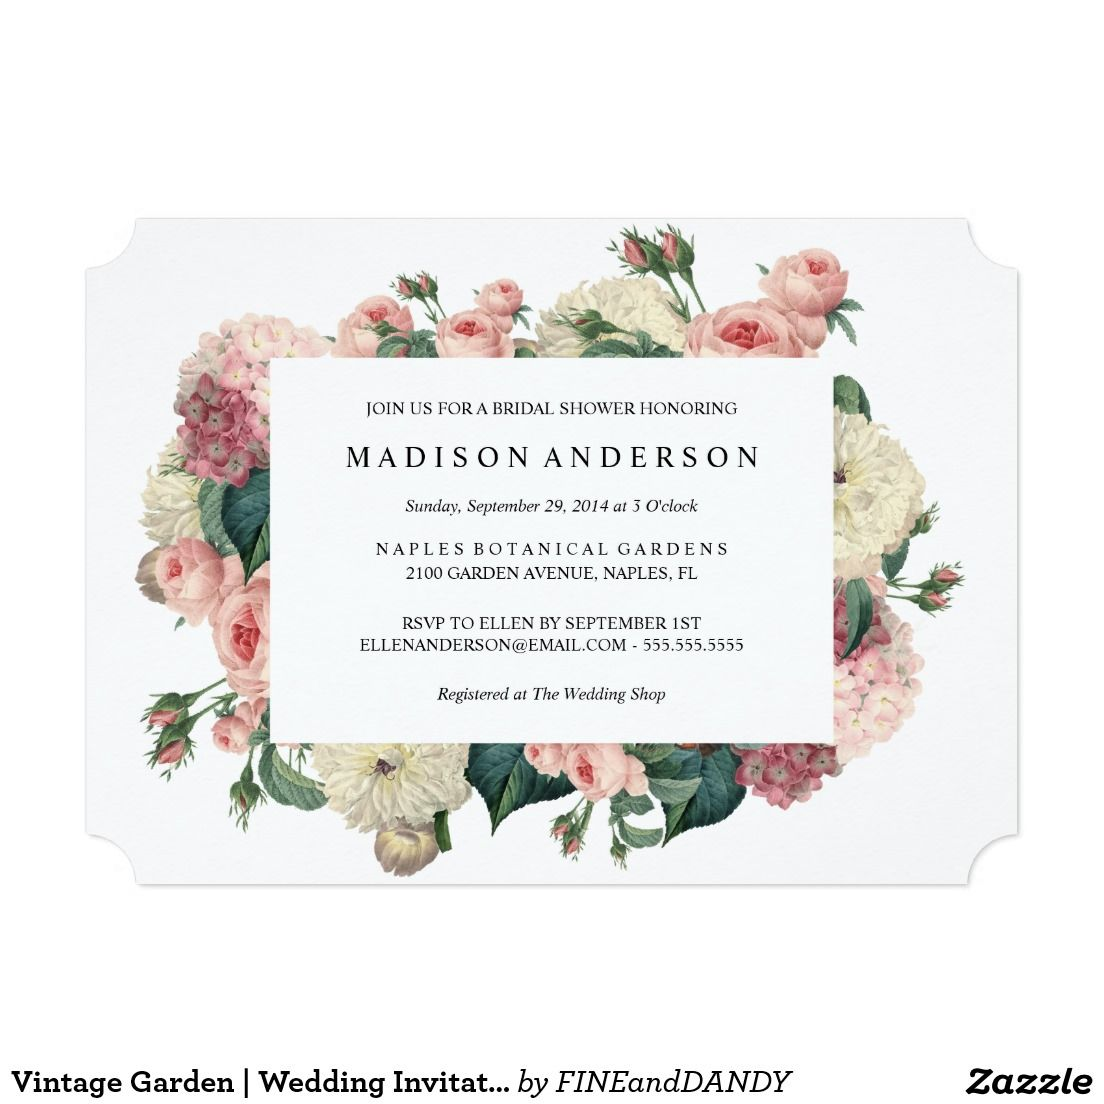 Vintage Garden | Wedding Invitation | Sister\'s wedding | Pinterest ...